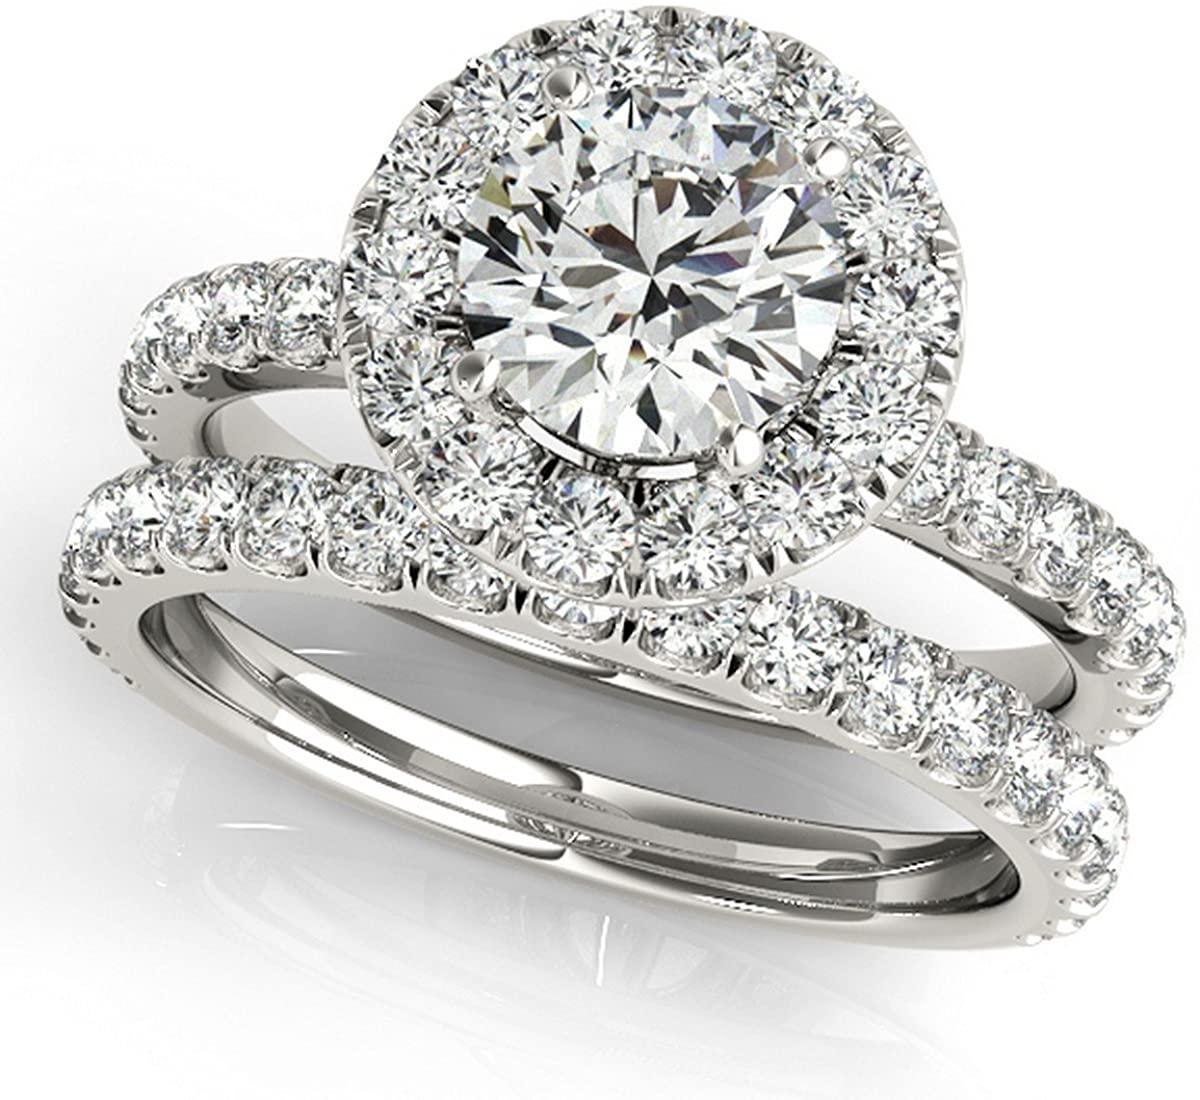 18k Gold French Pave Halo Diamond Bridal Ring and Semi Eternity Band Bridal Set (3.25ct)